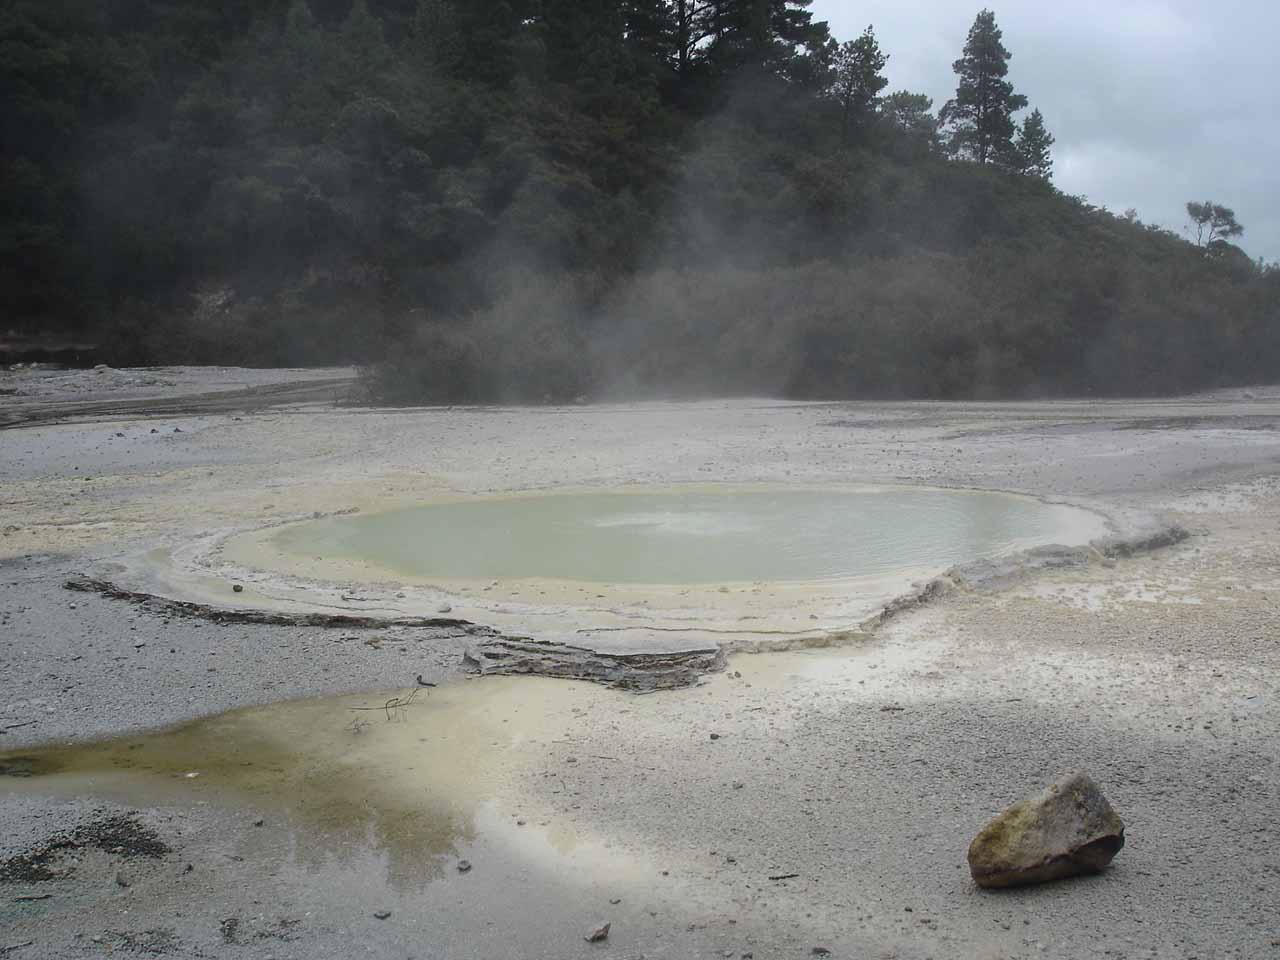 More thermal pools and springs in Wai-o-tapu